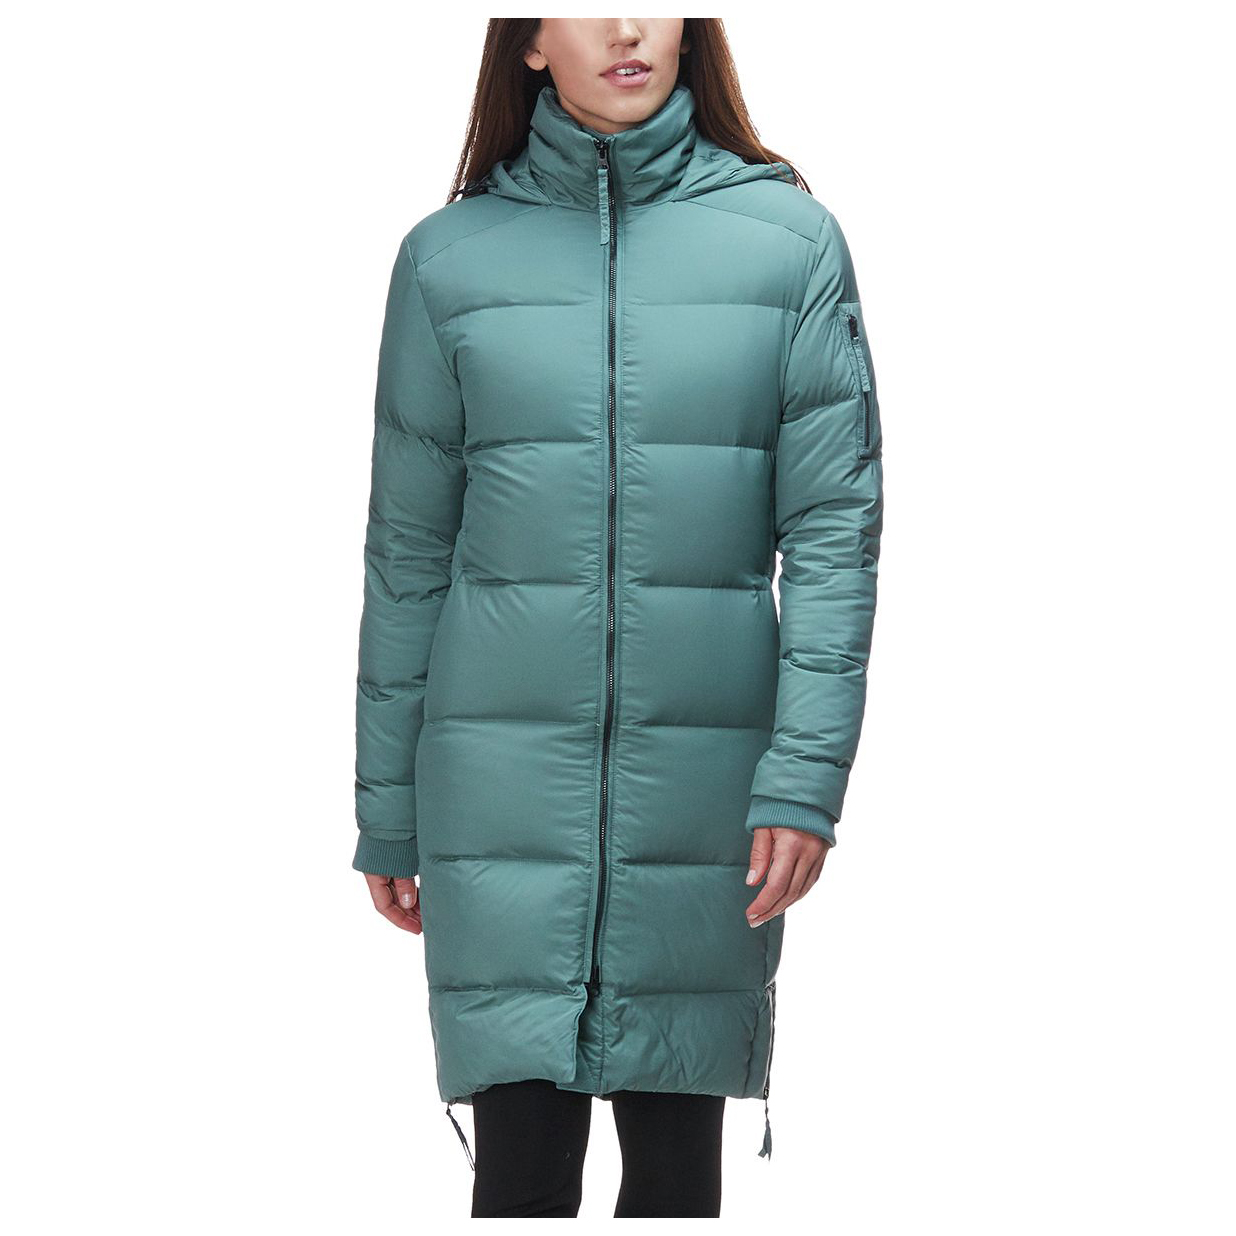 Basin + Range Women's Northstar Down Jacket Daunenjacke Insignia Blue | XS